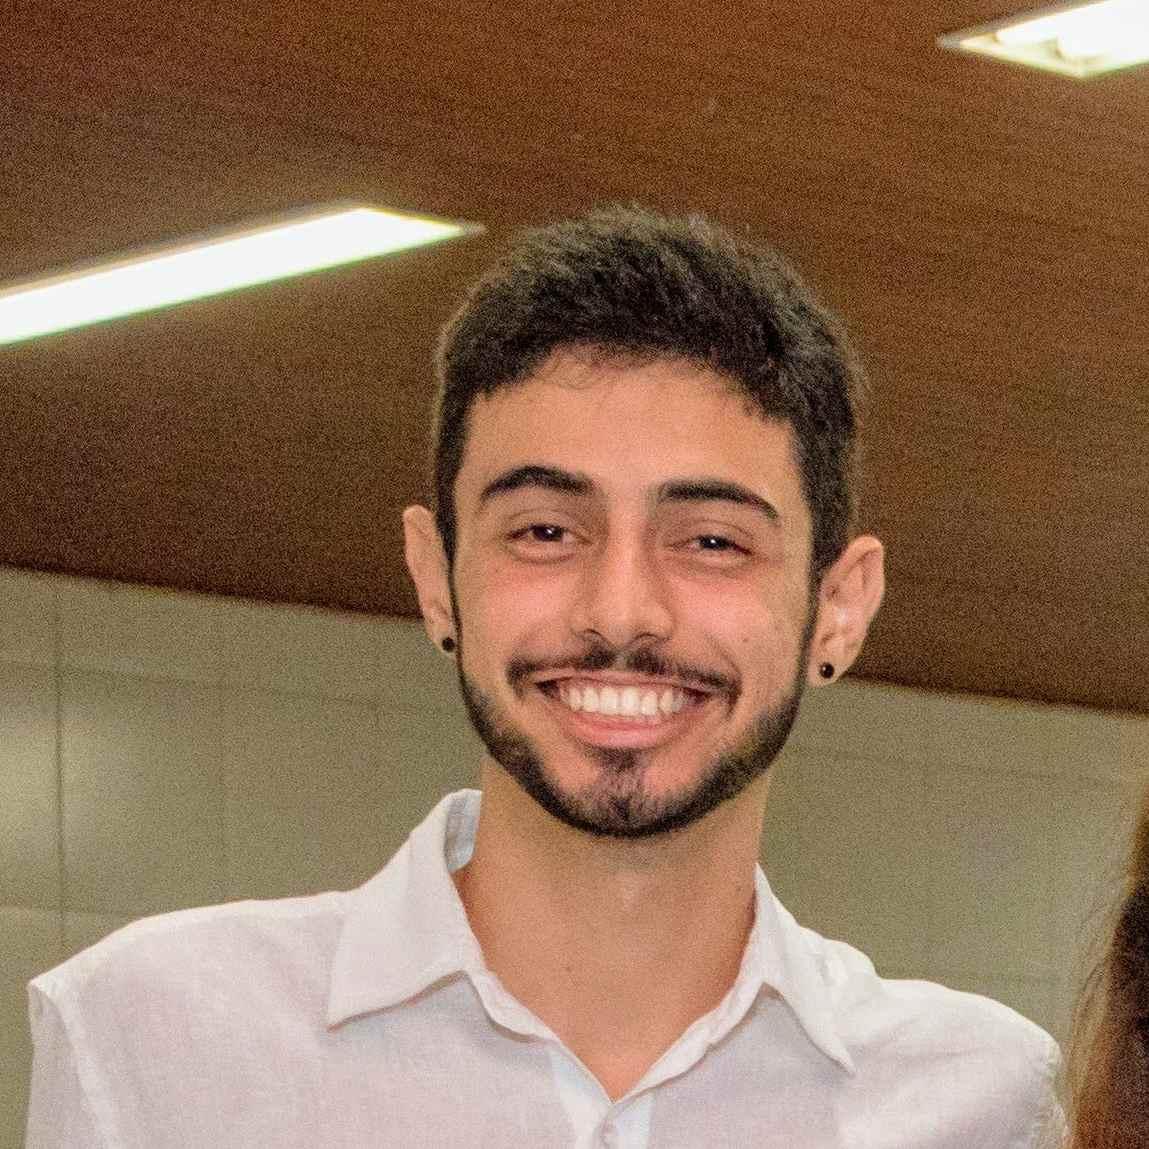 João Henrique de Araujo Morais